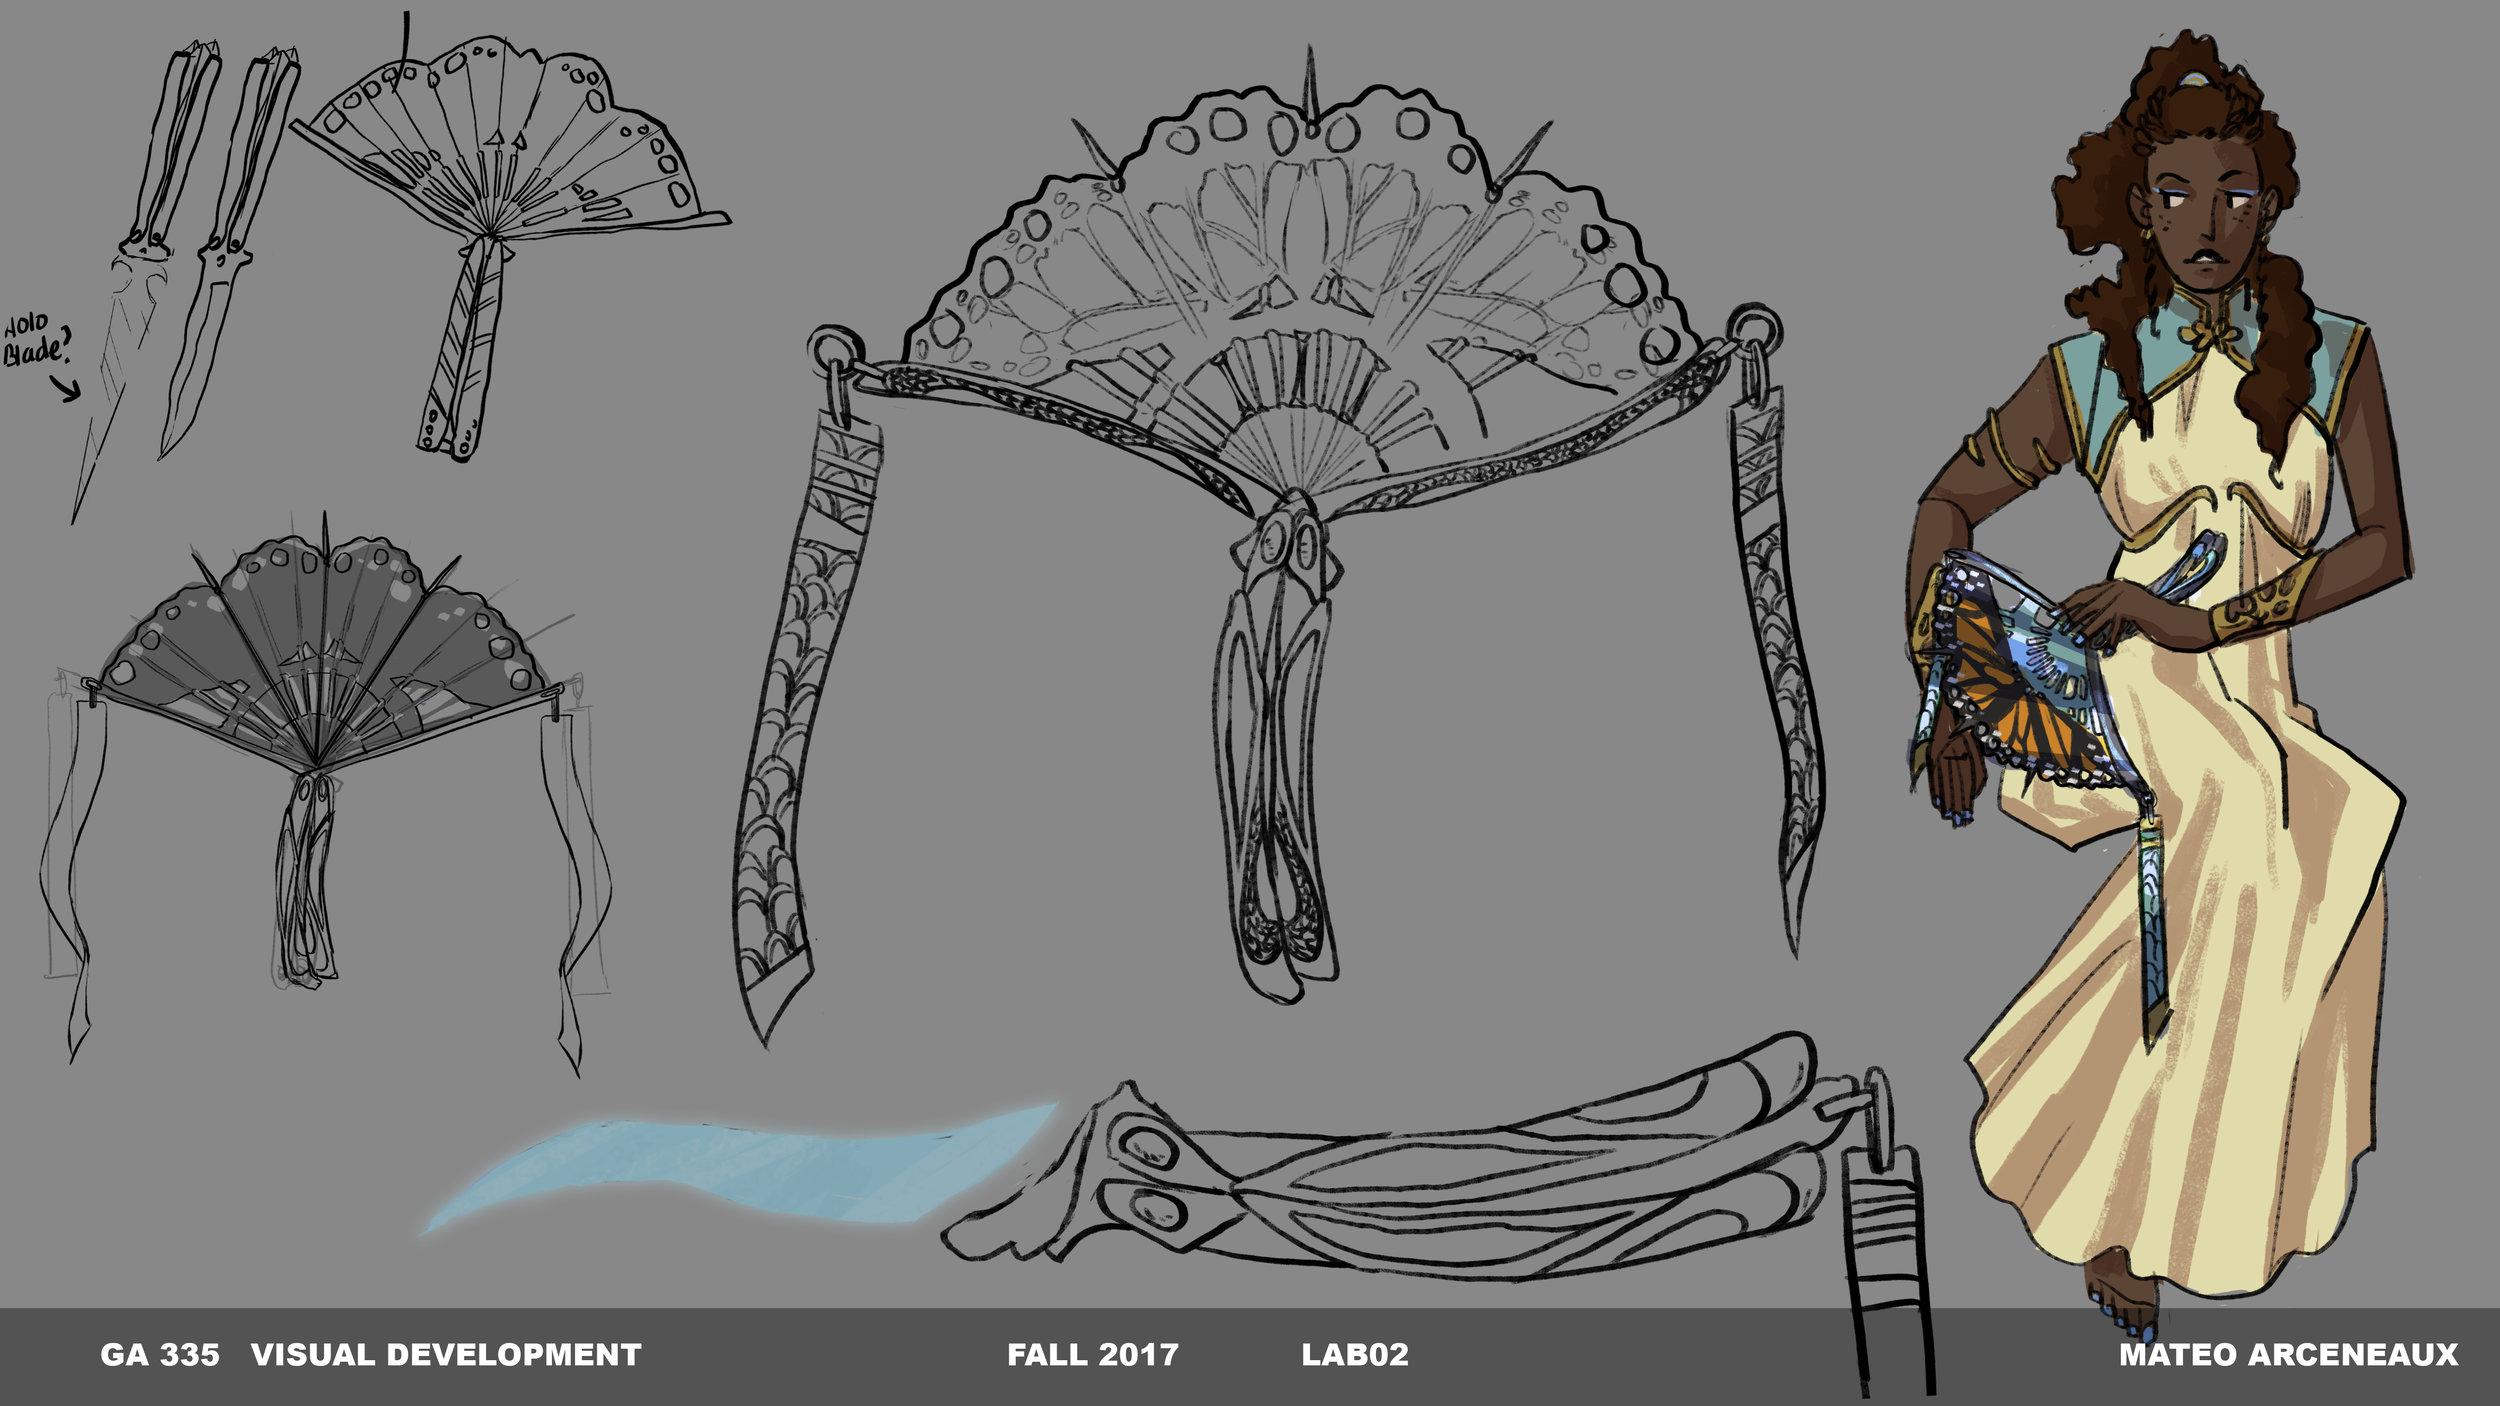 Marcenea_GAME335_LAB02_Sketch2.jpg